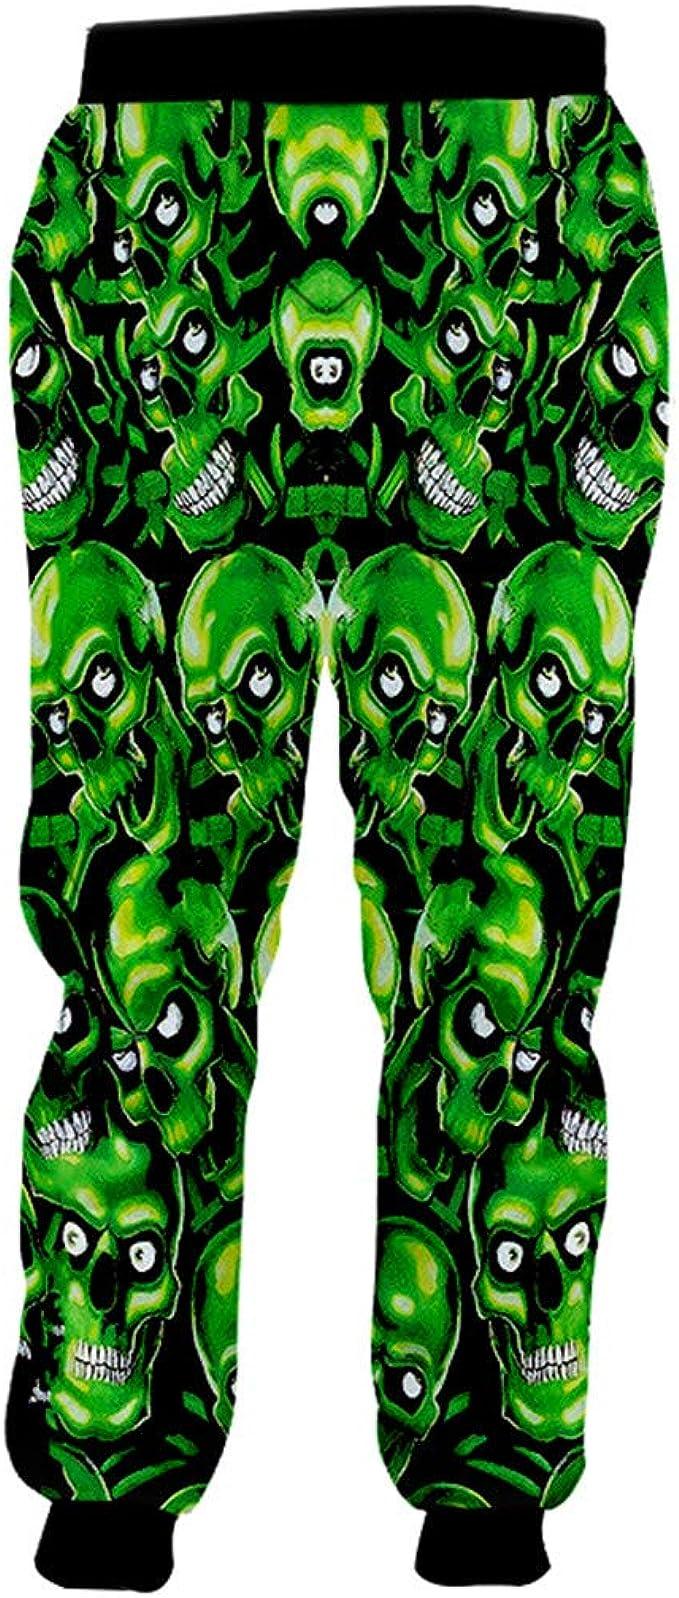 Pantalones de chándal de poliéster Hombre Hip Hop Cráneos Verdes ...